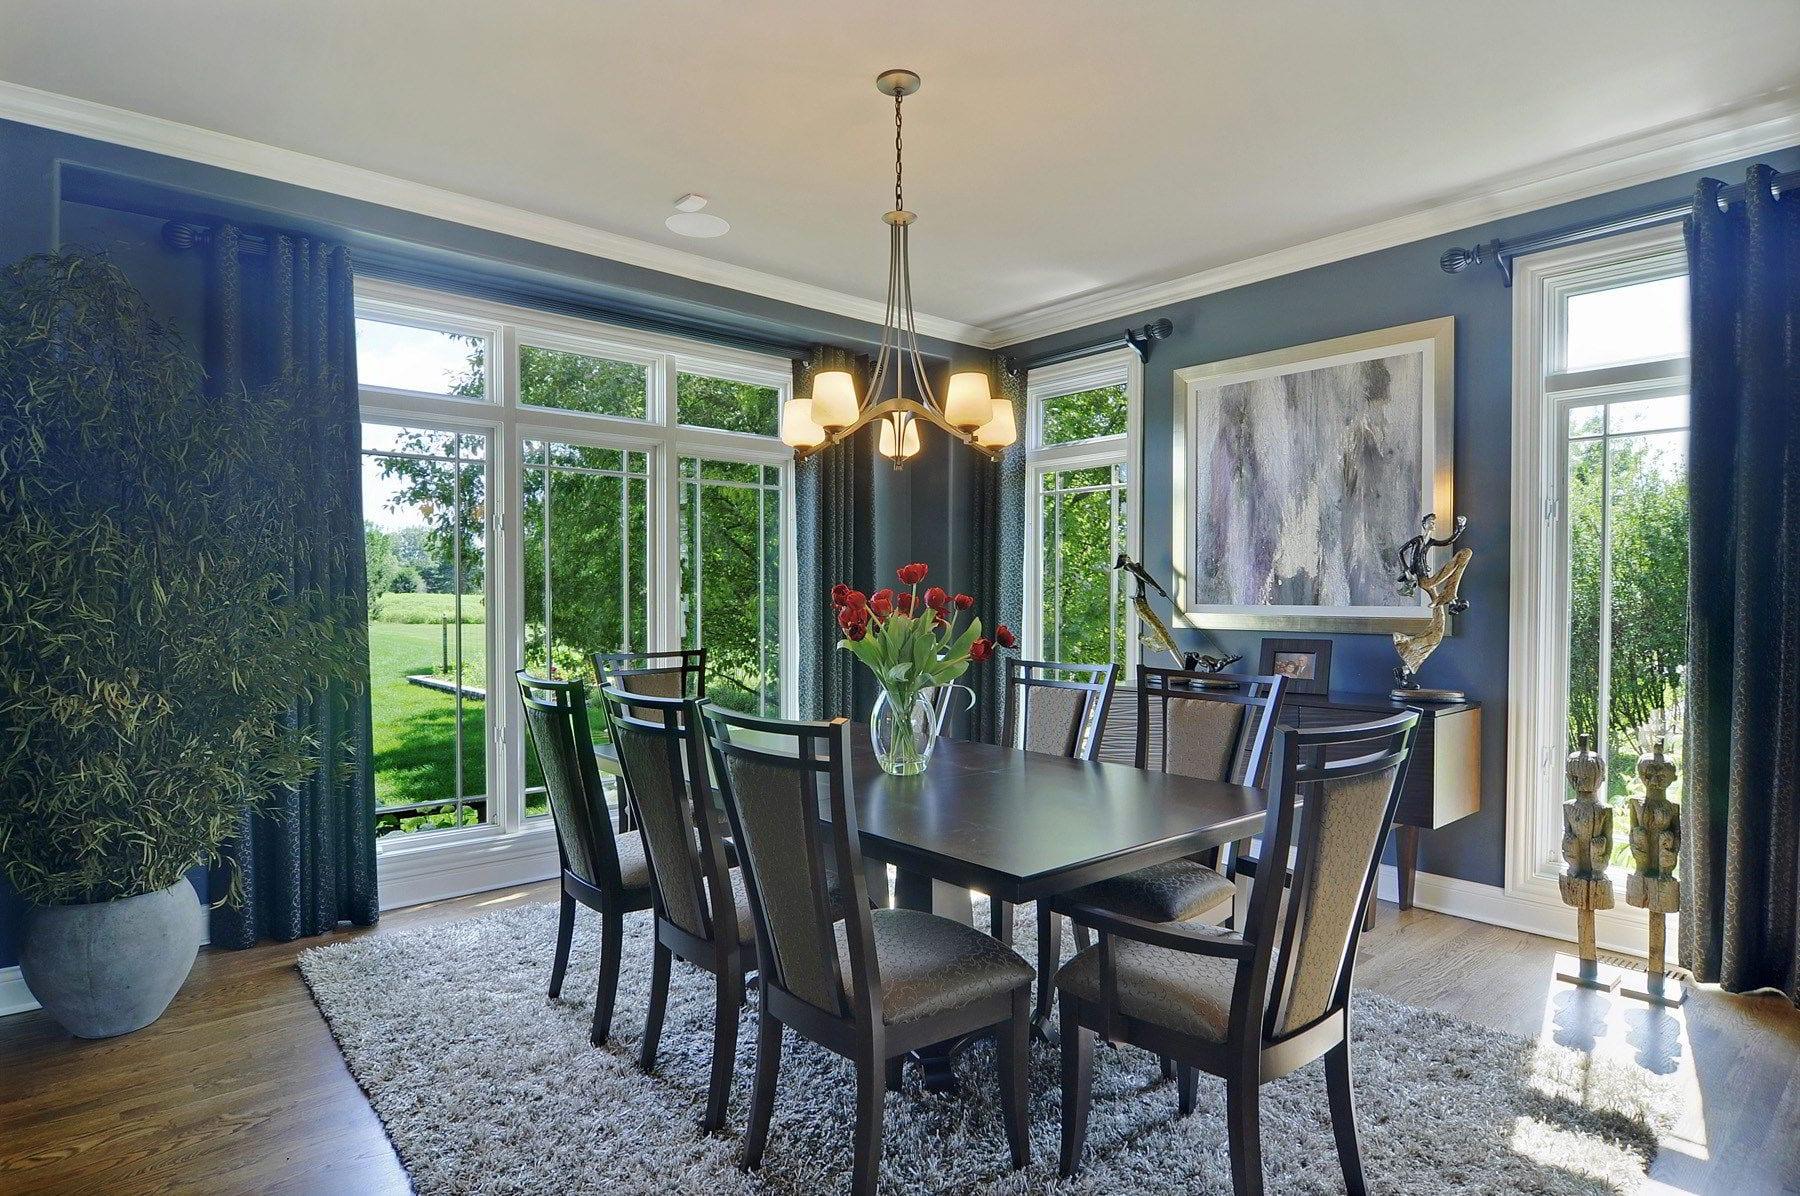 Interior Designer Design Consultant Furnishings Home Remodeling